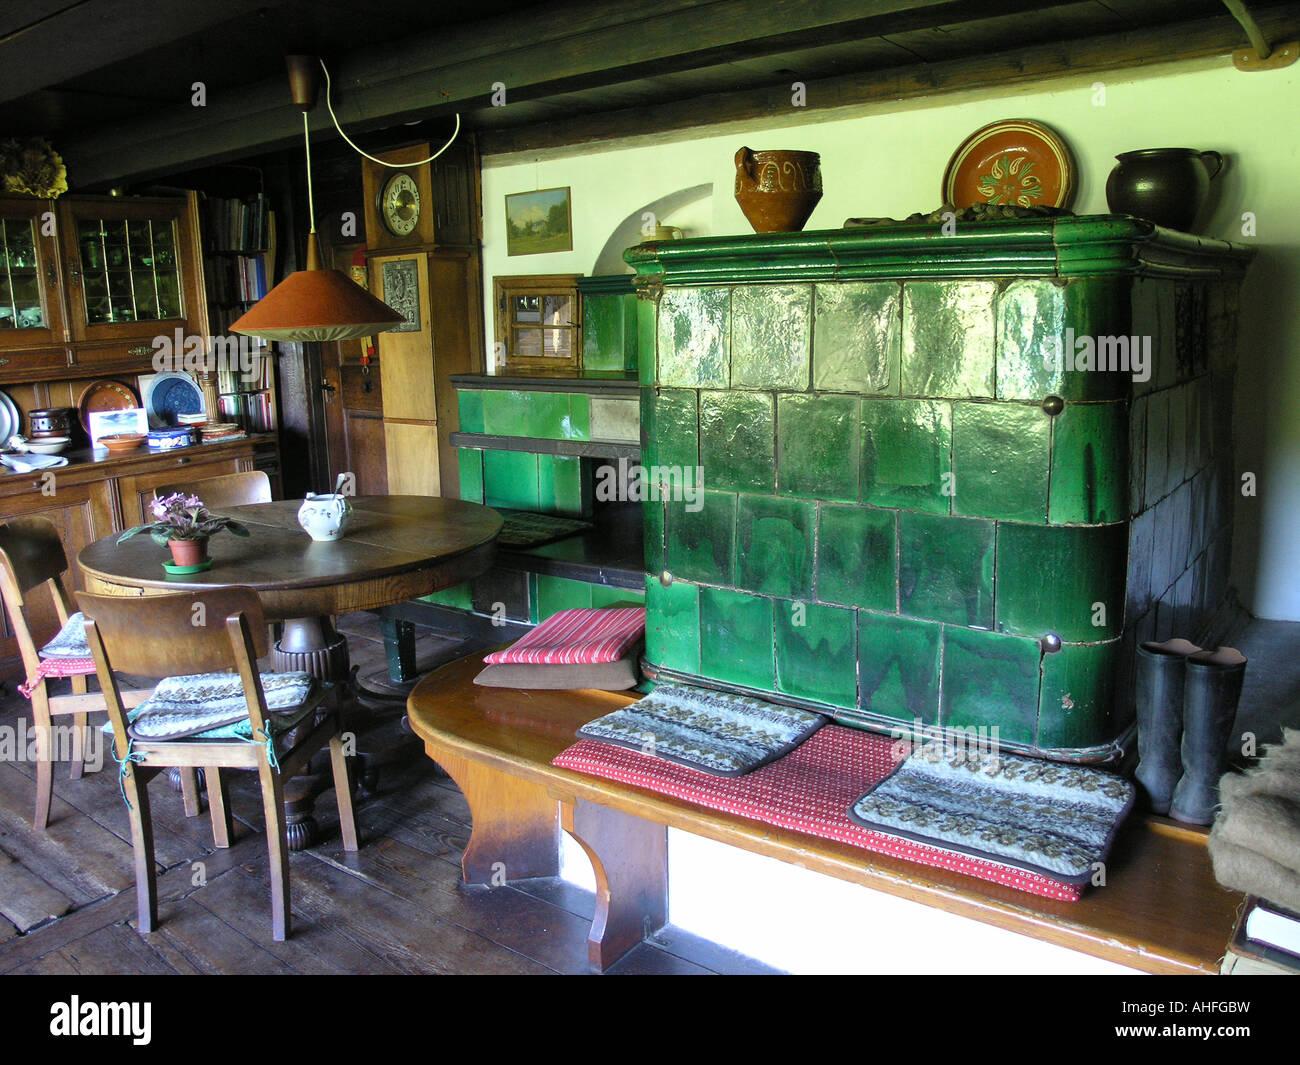 Stube mit Kachelofen in historischem Schwarzwaldbauernhof  parlor with tiled stove in historic blackforest farmhouse - Stock Image